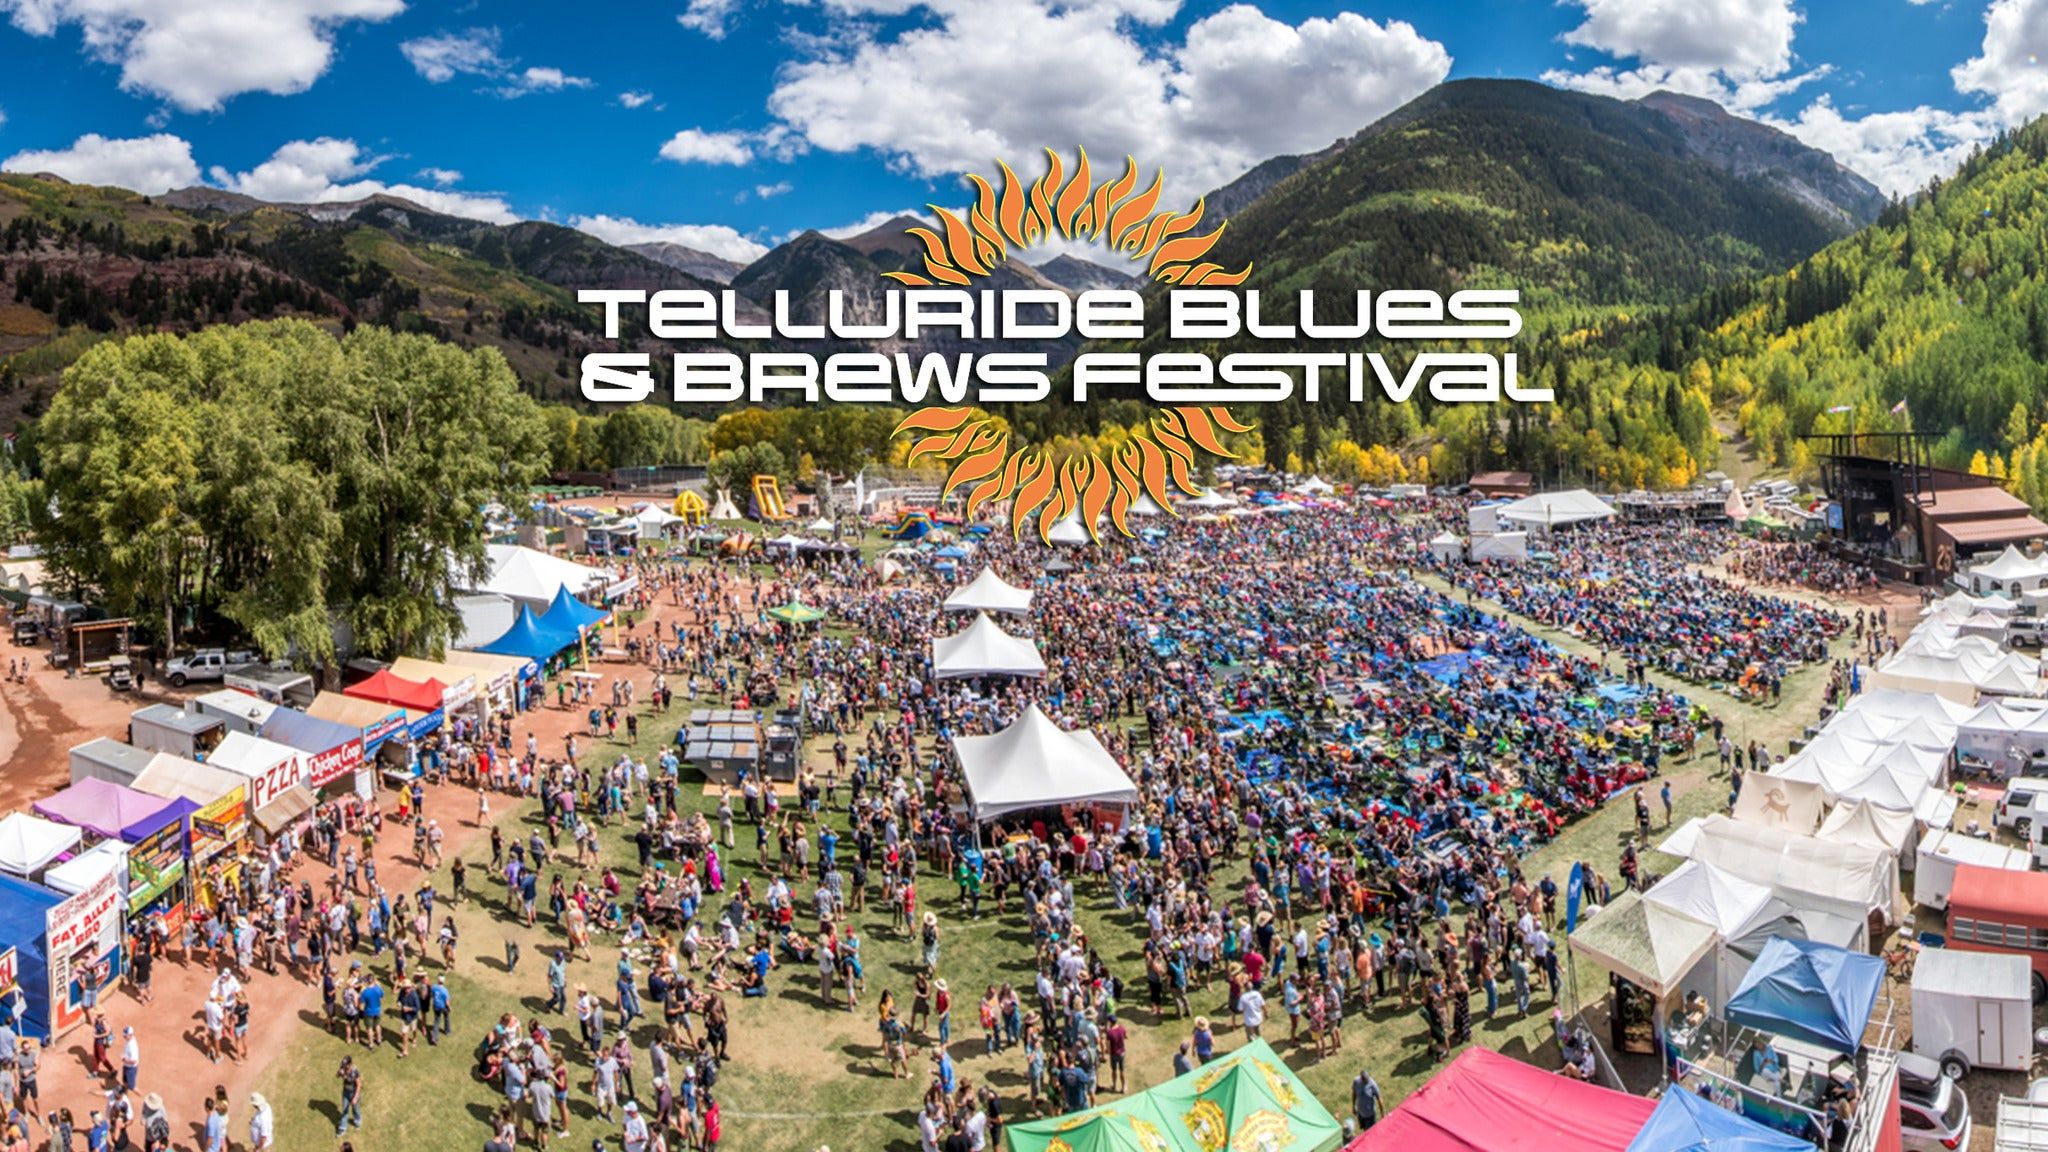 Telluride Blues & Brews Festival at Telluride Town Park